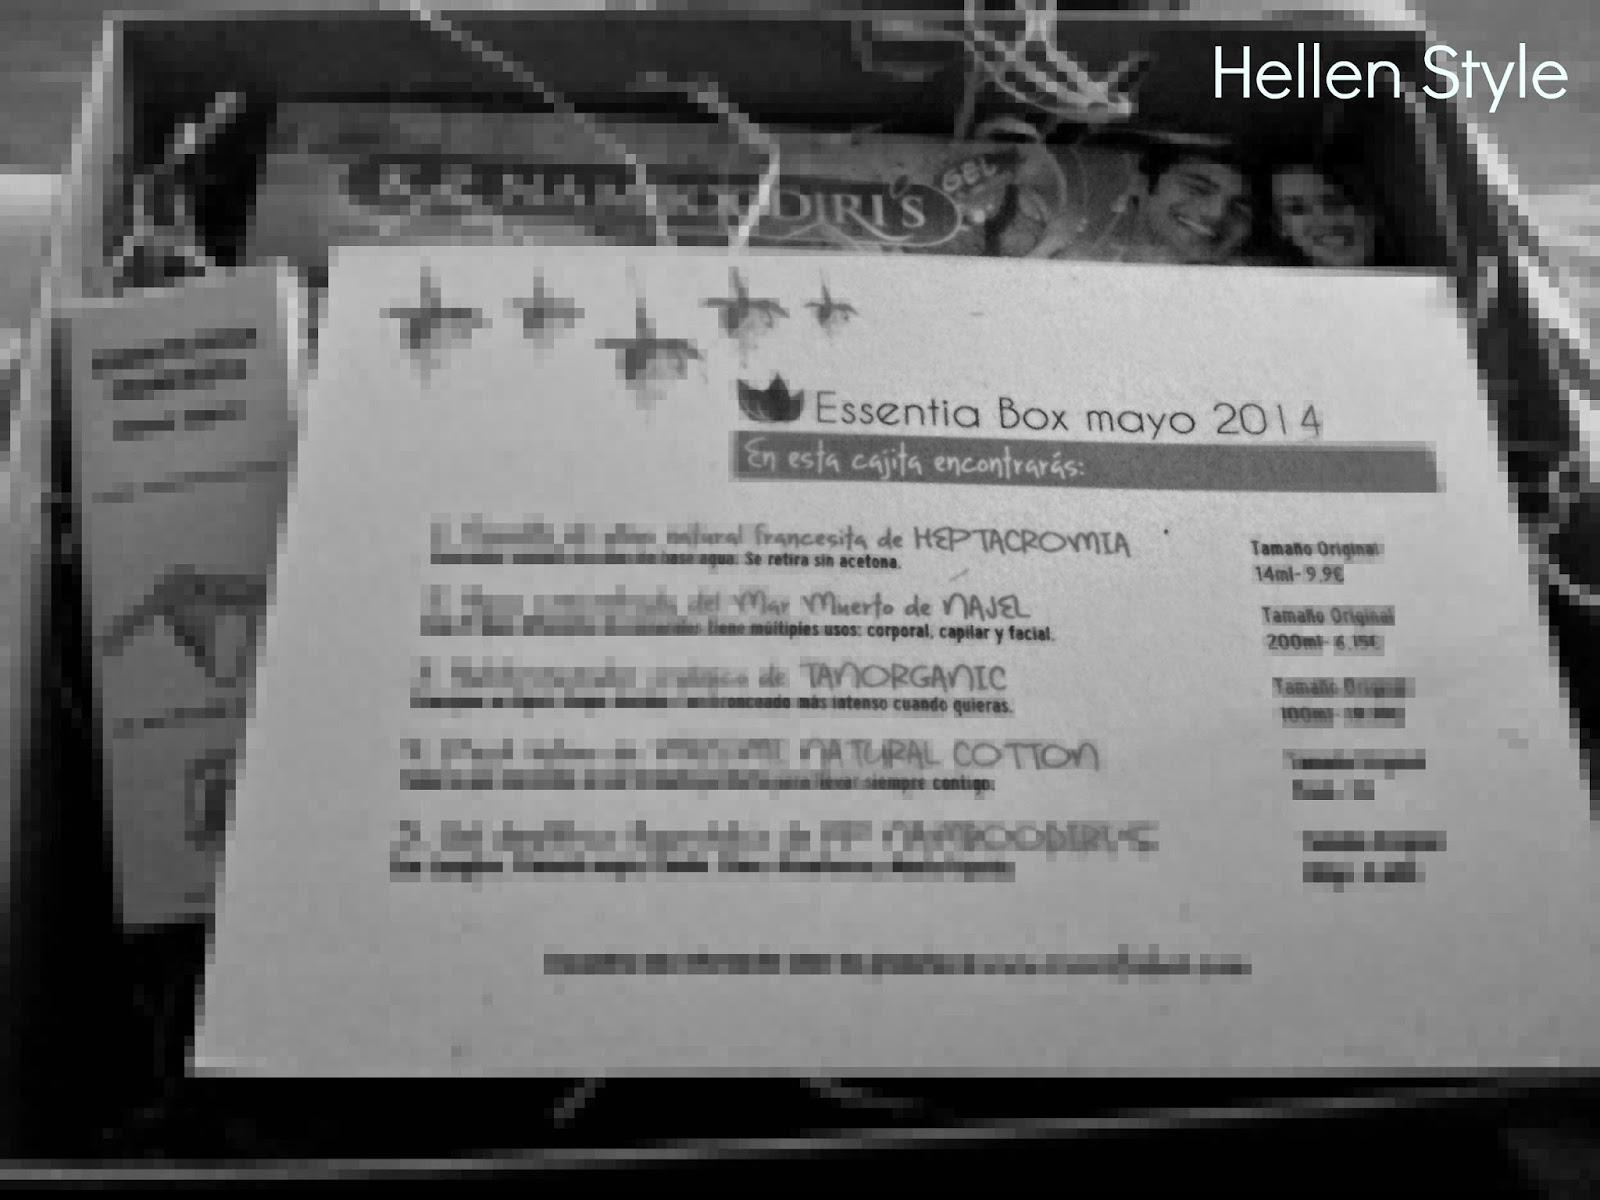 Essentia box mayo 2014